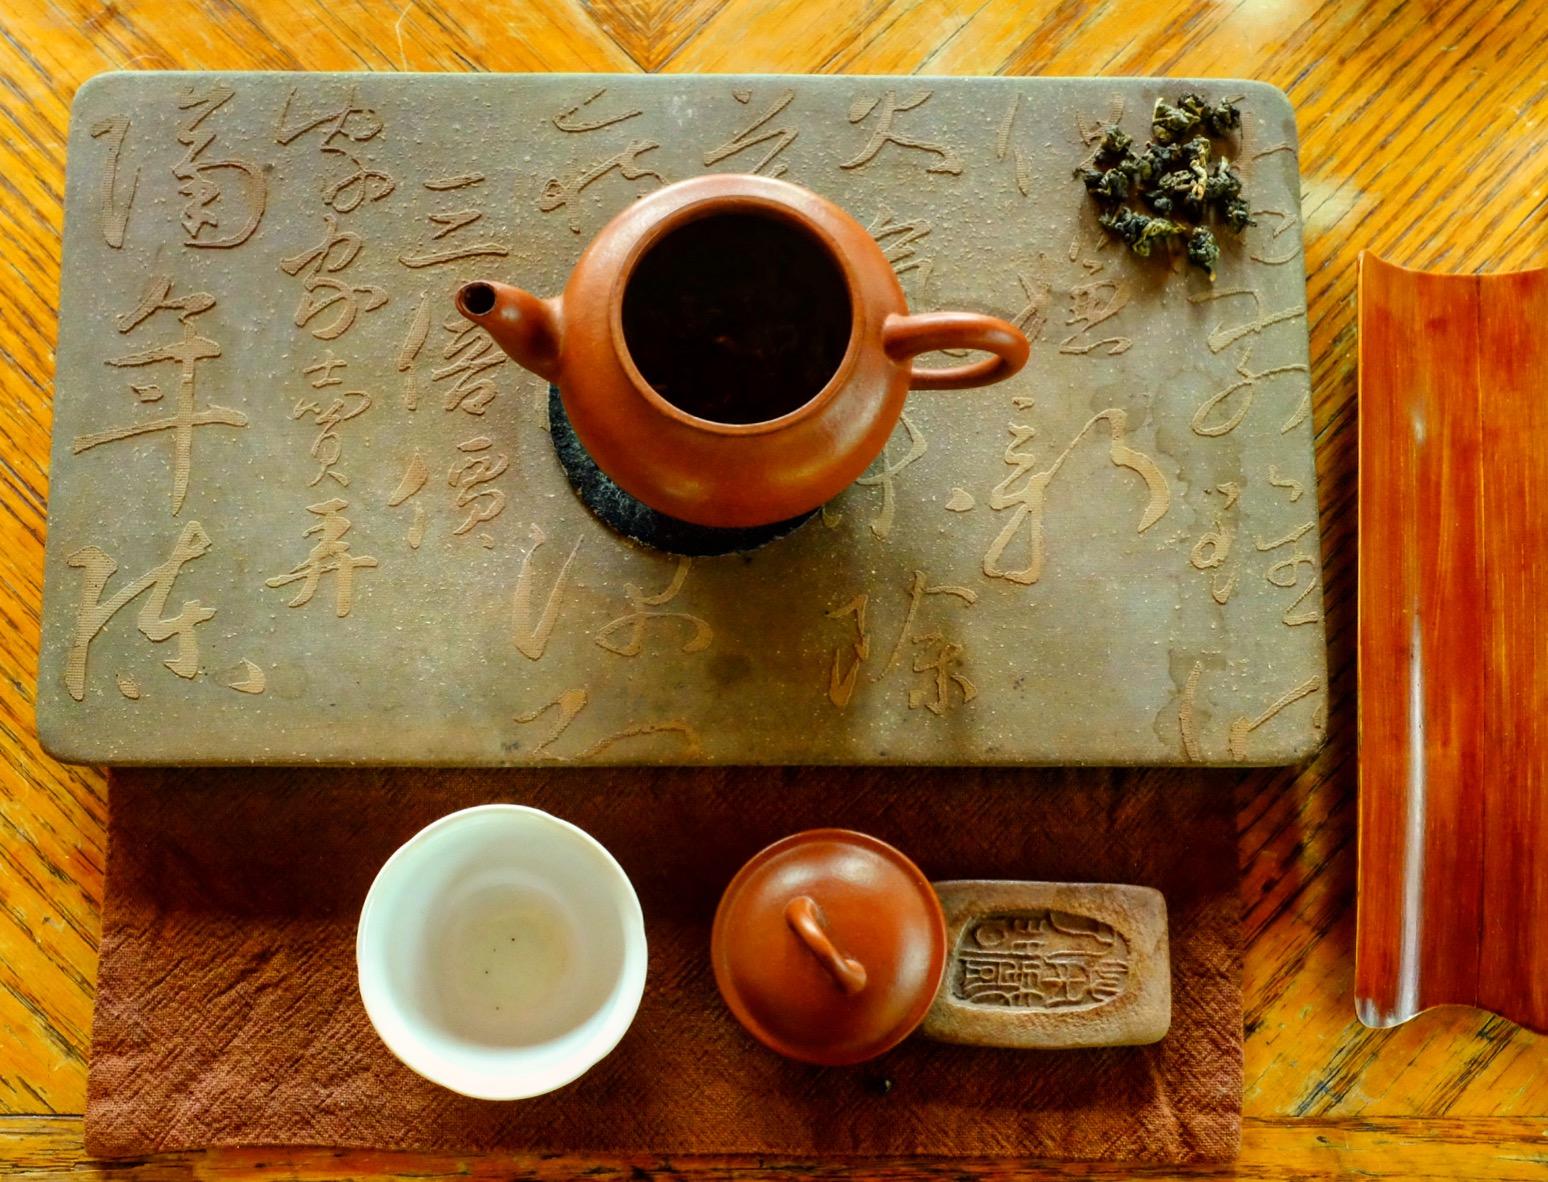 Le Chameau Bleu - Cérémonie du thé à DonDingShan Taiwan - Séjour taiwan